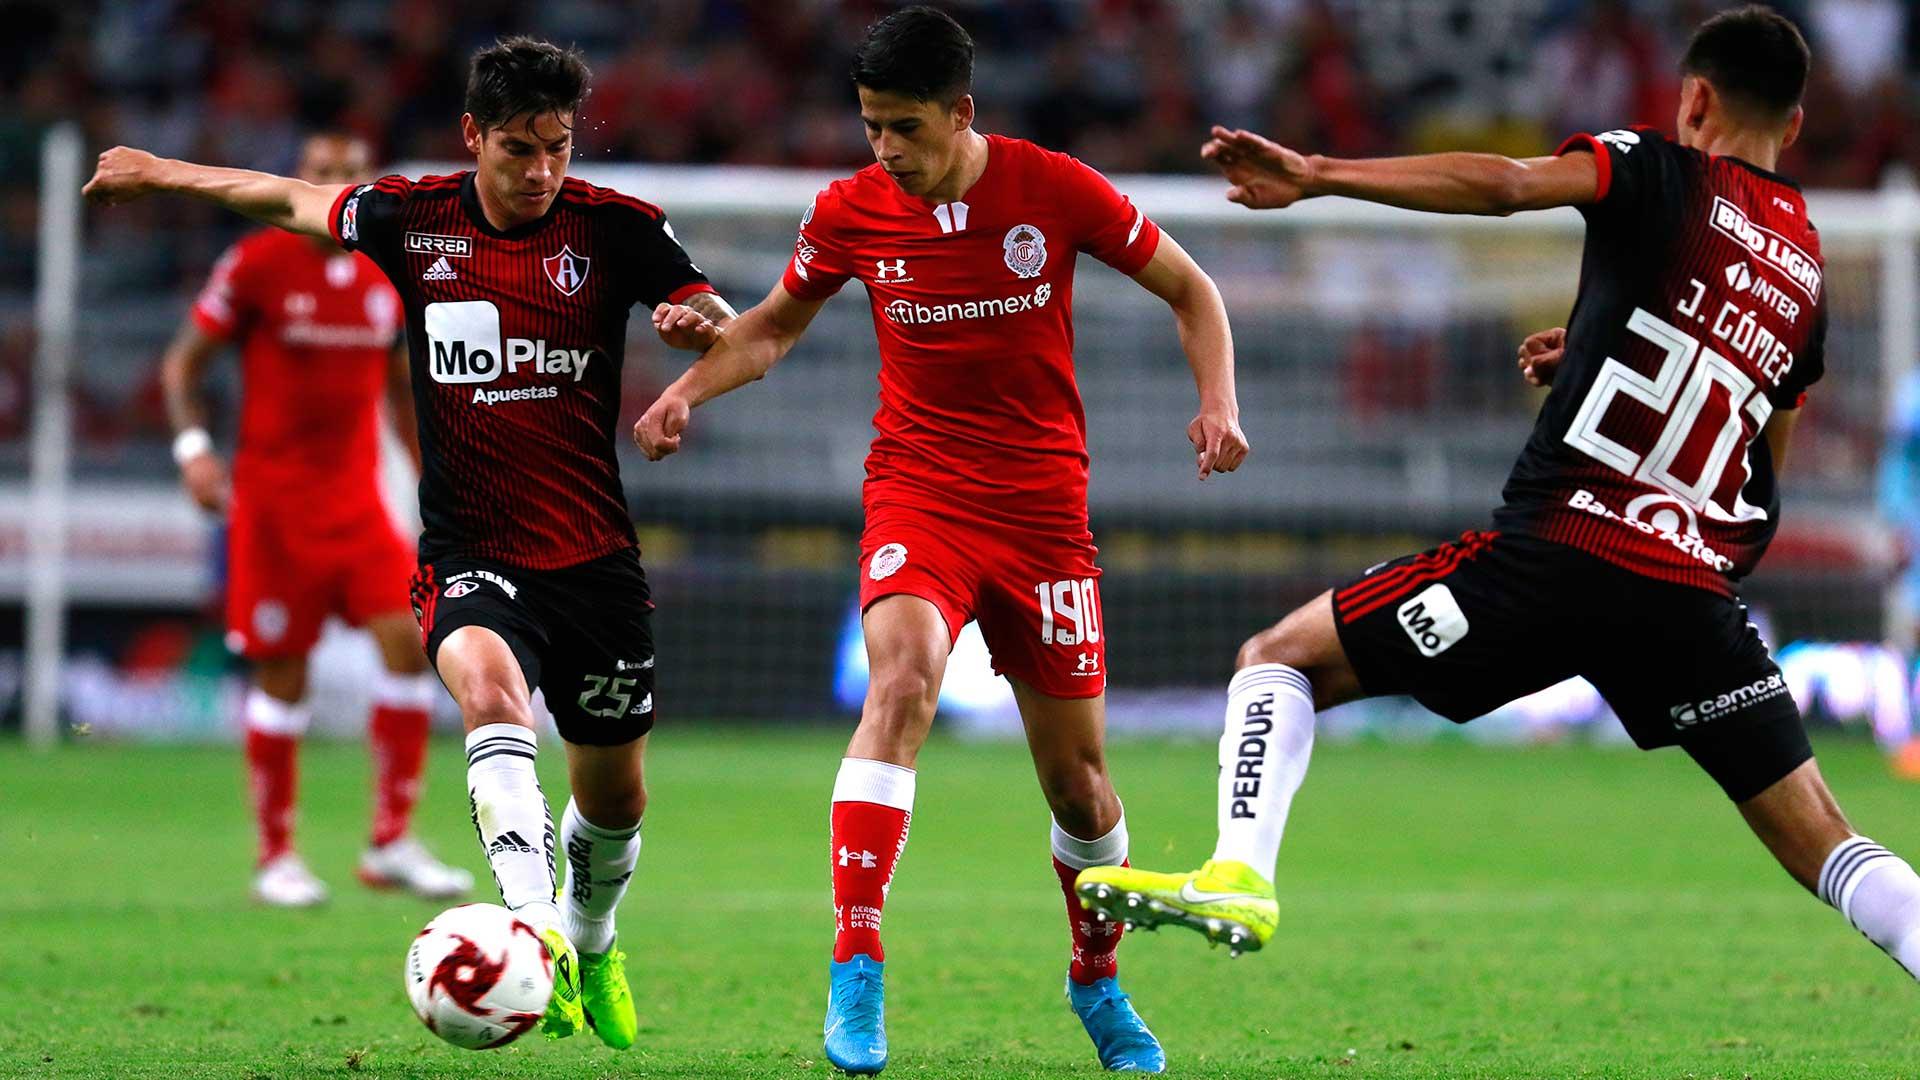 Toluca FC vs Atlas Cuartos de Final de la Copa MX